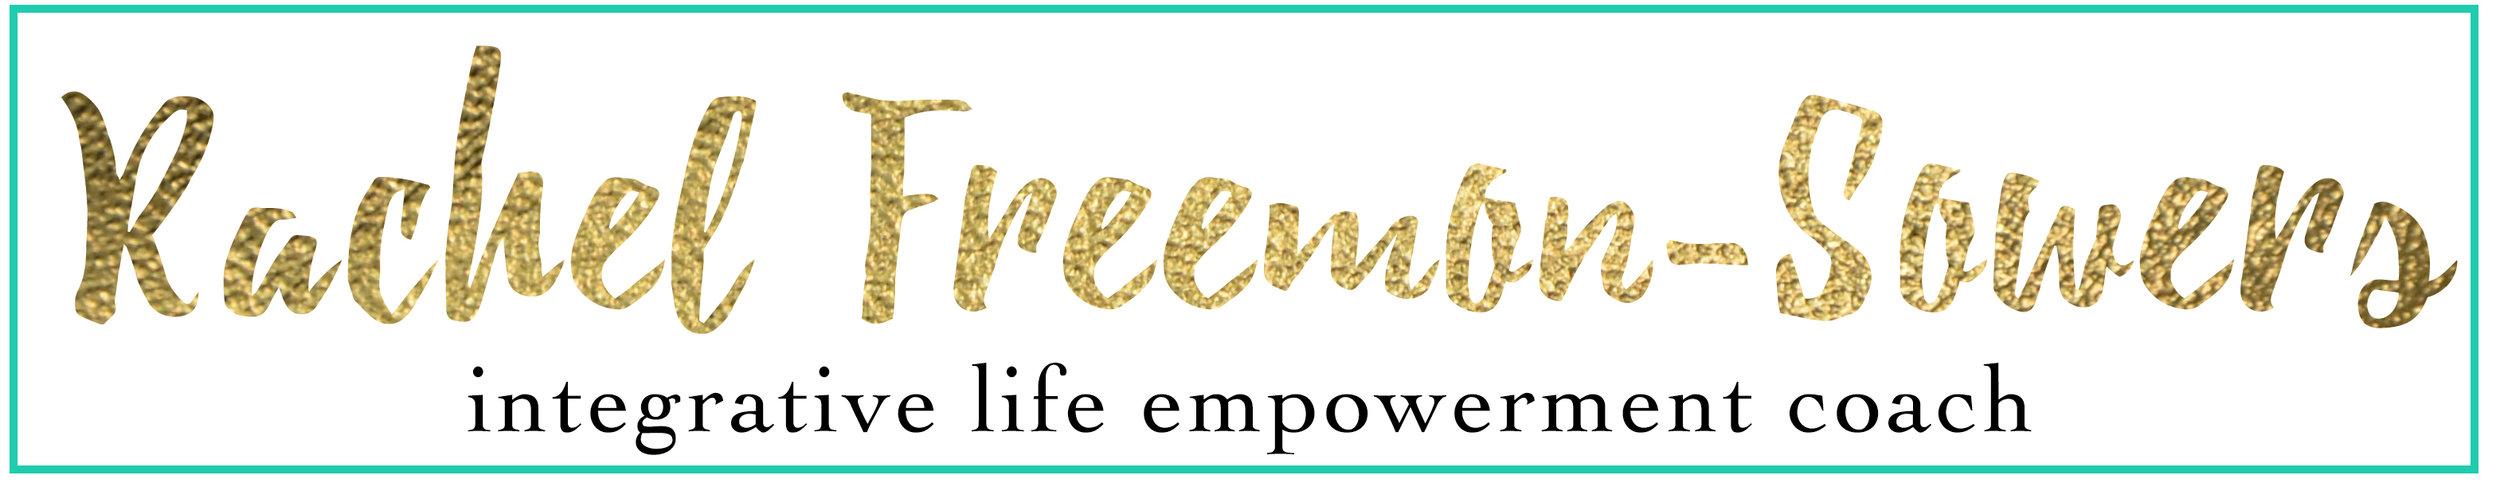 Redding Health Expo - Life Empowerment Coach